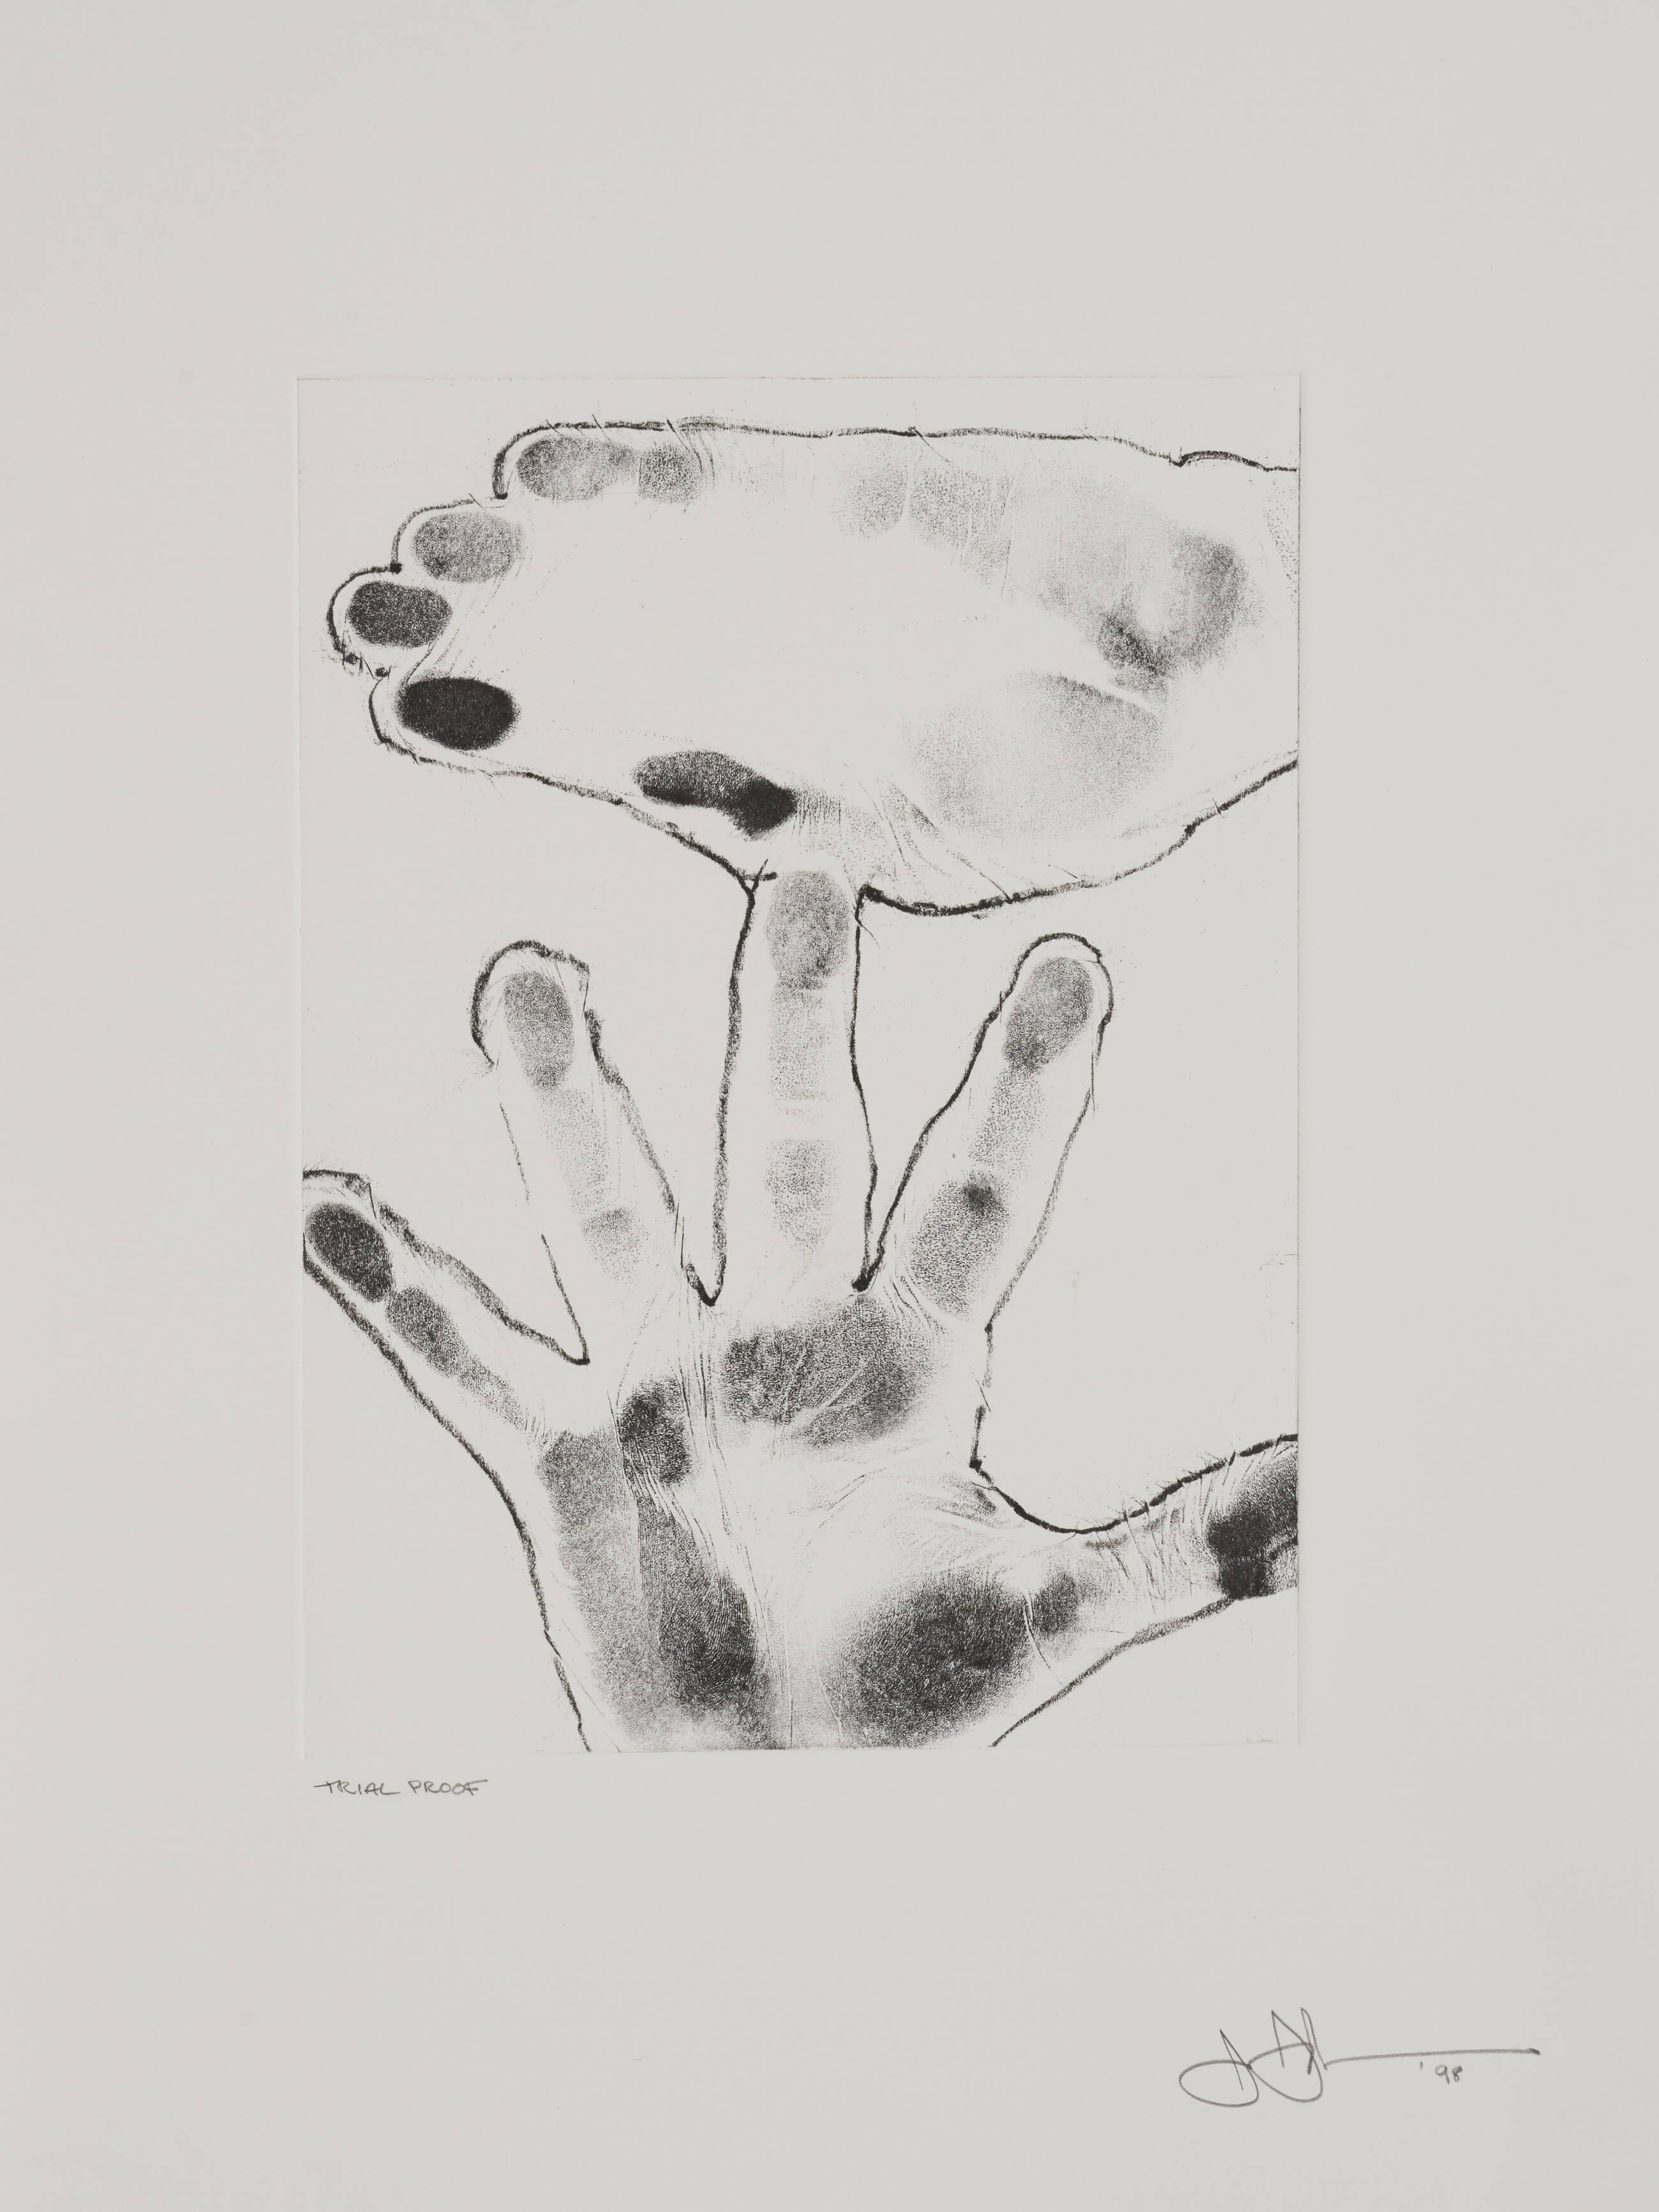 Untitled, 1998, by Jasper Johns